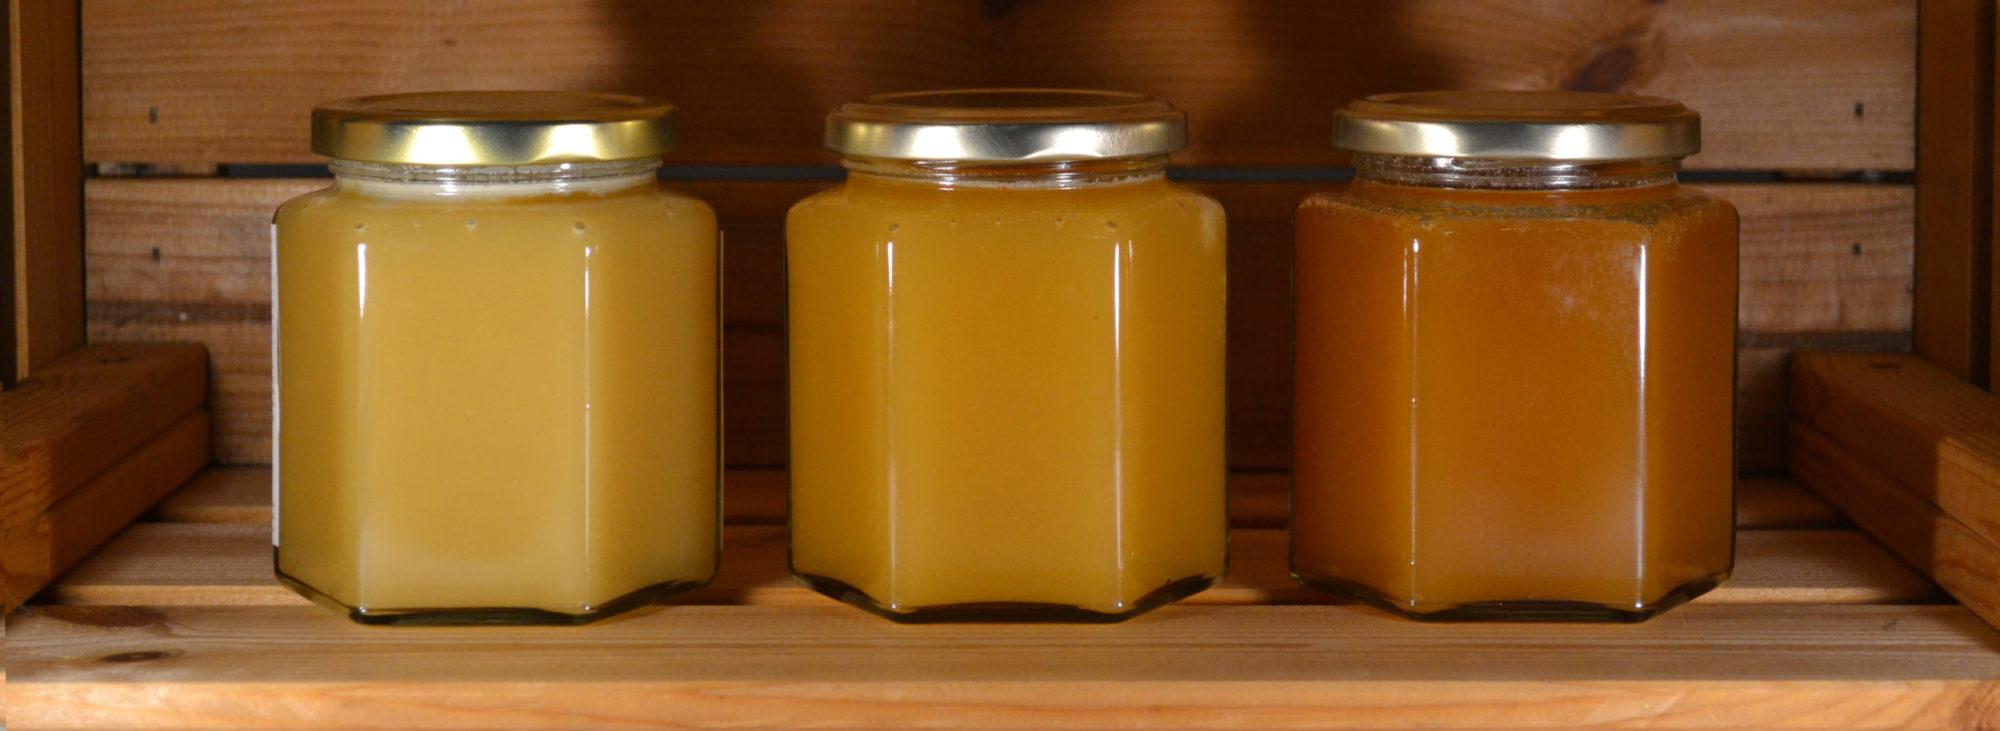 Samuel Tryggers lokala honung